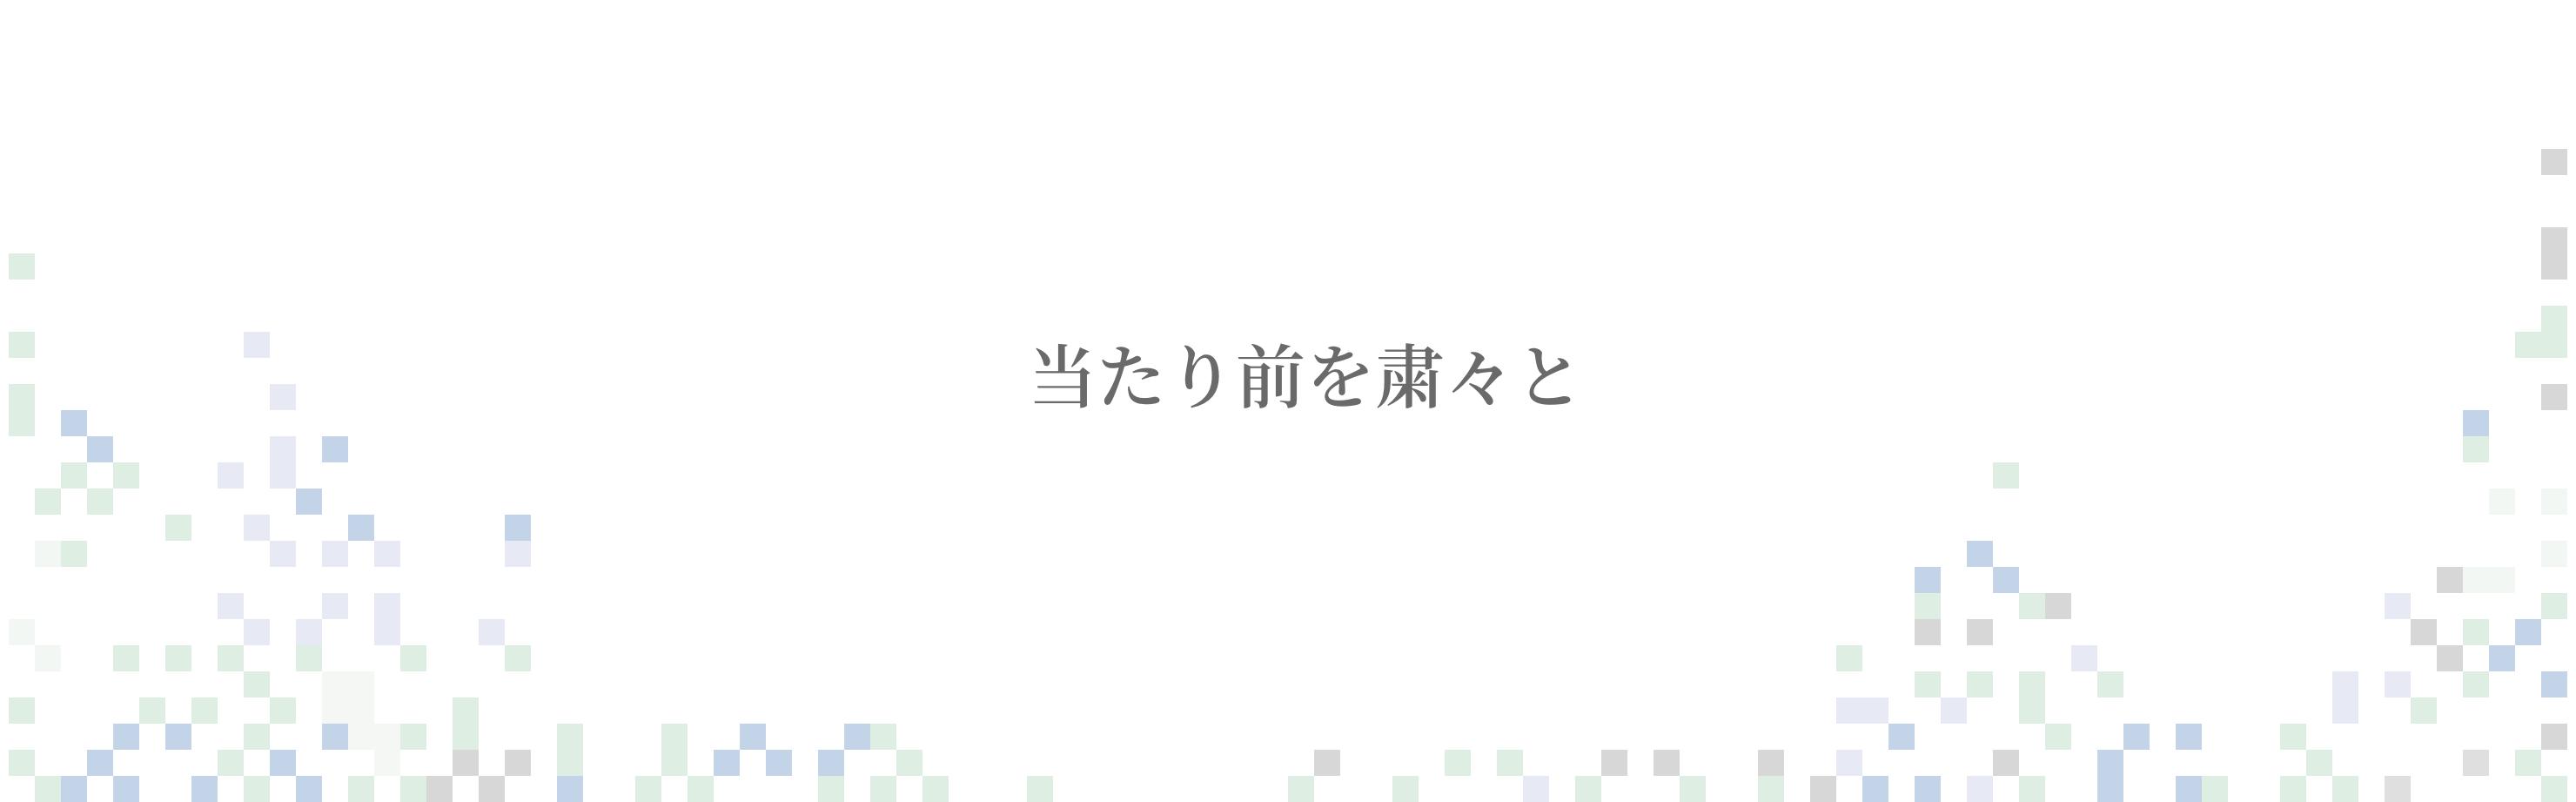 pc_002